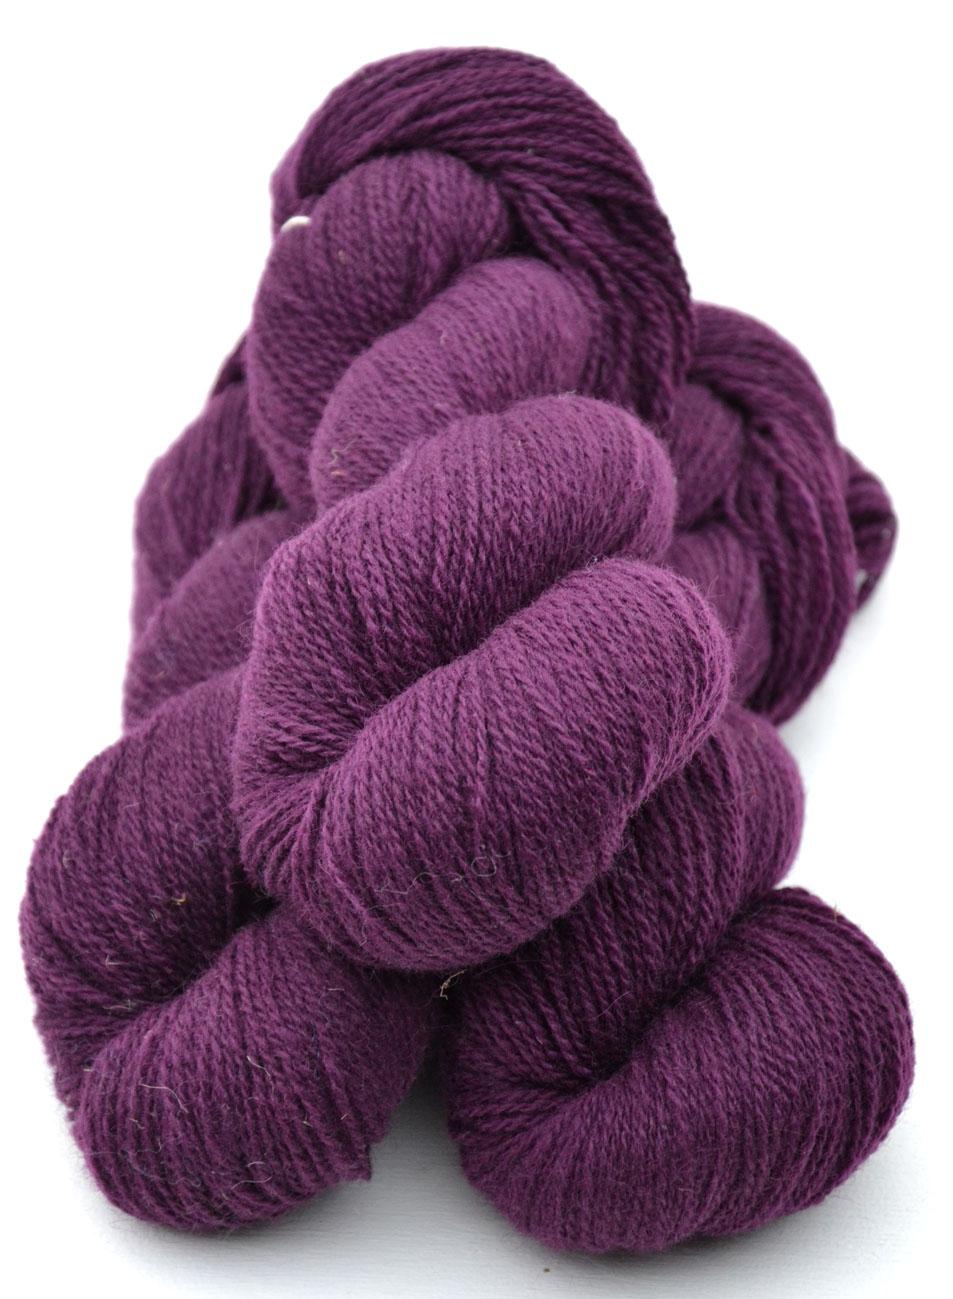 Ullcentrum 6/2-5102 Rotviolett auf hellem Gotland  Reddish Purple on light Gotland lila